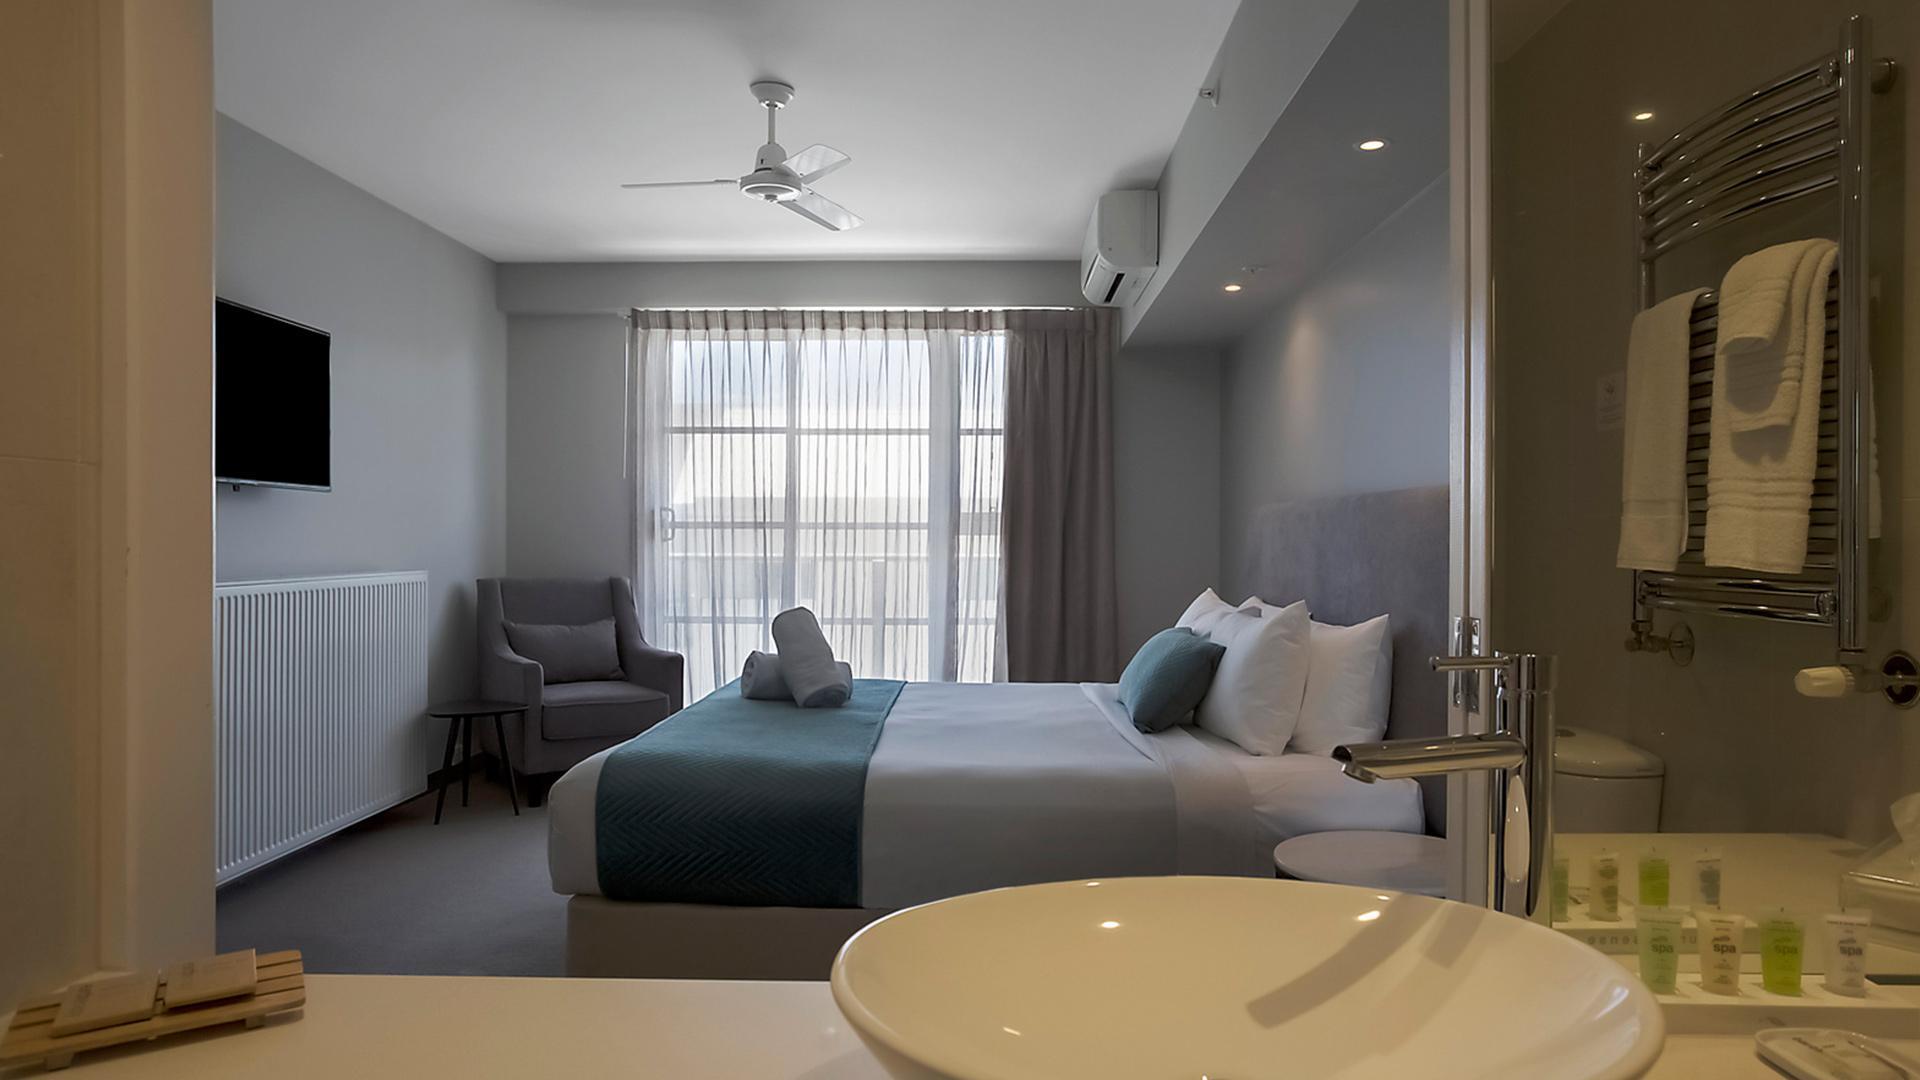 Premium Studio Queen image 1 at Deep Blue Hotel & Hot Springs by Warrnambool City, Victoria, Australia